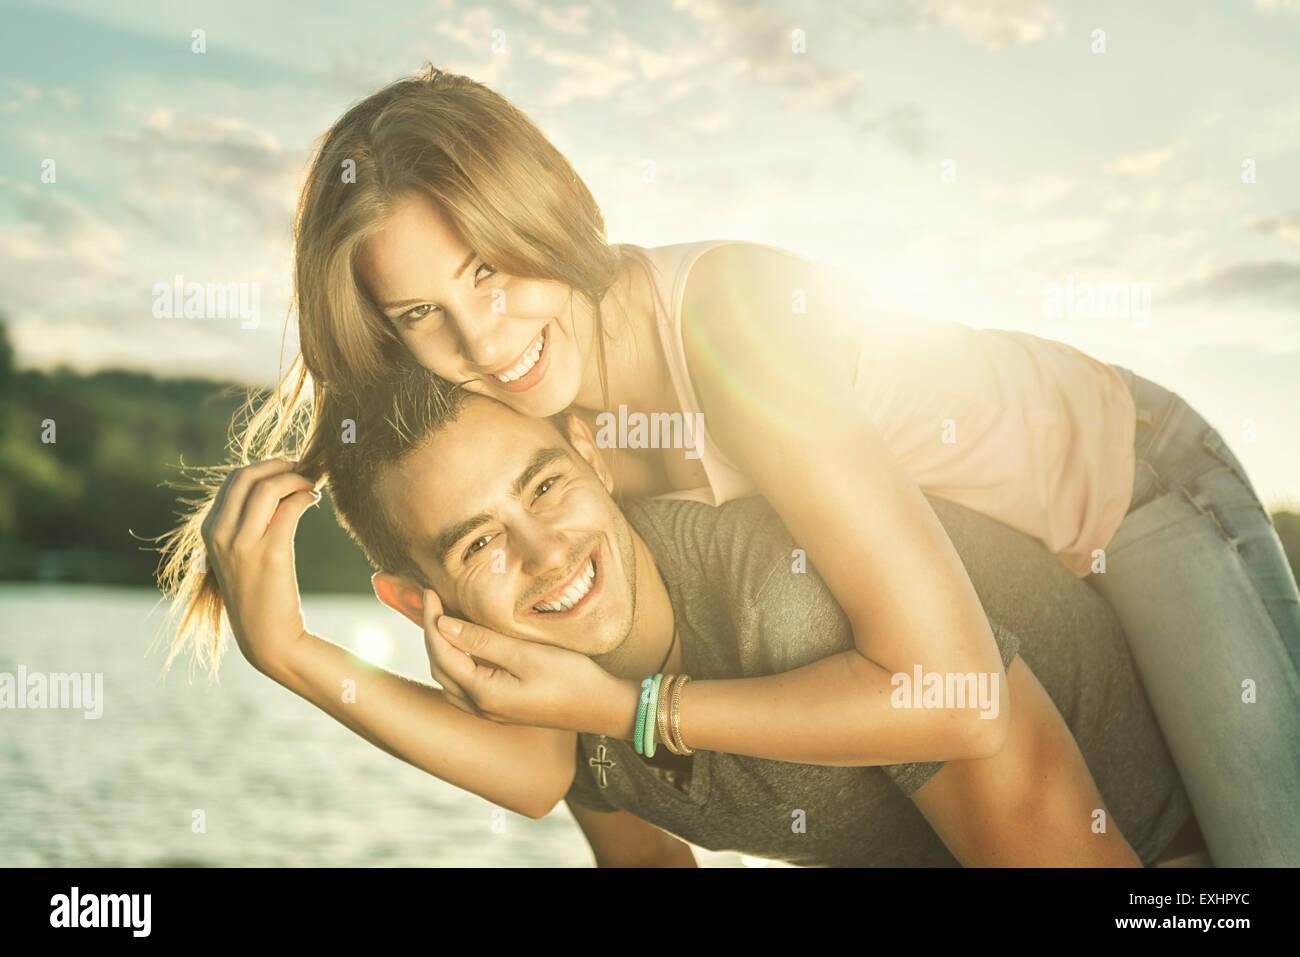 Couple in love embrassant au bord du lac, sun flare Photo Stock